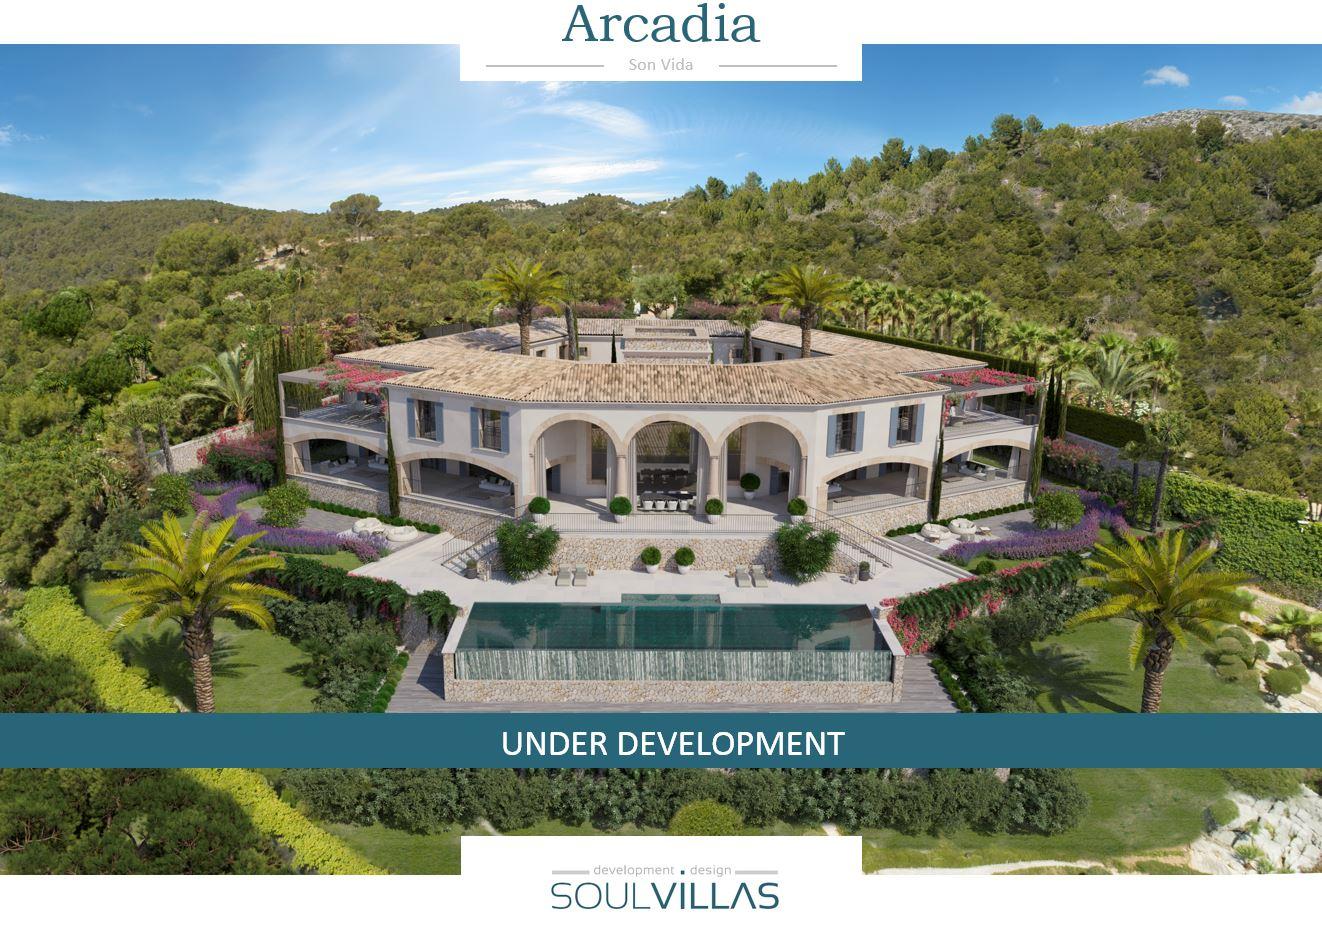 Arcadia - Son Vida